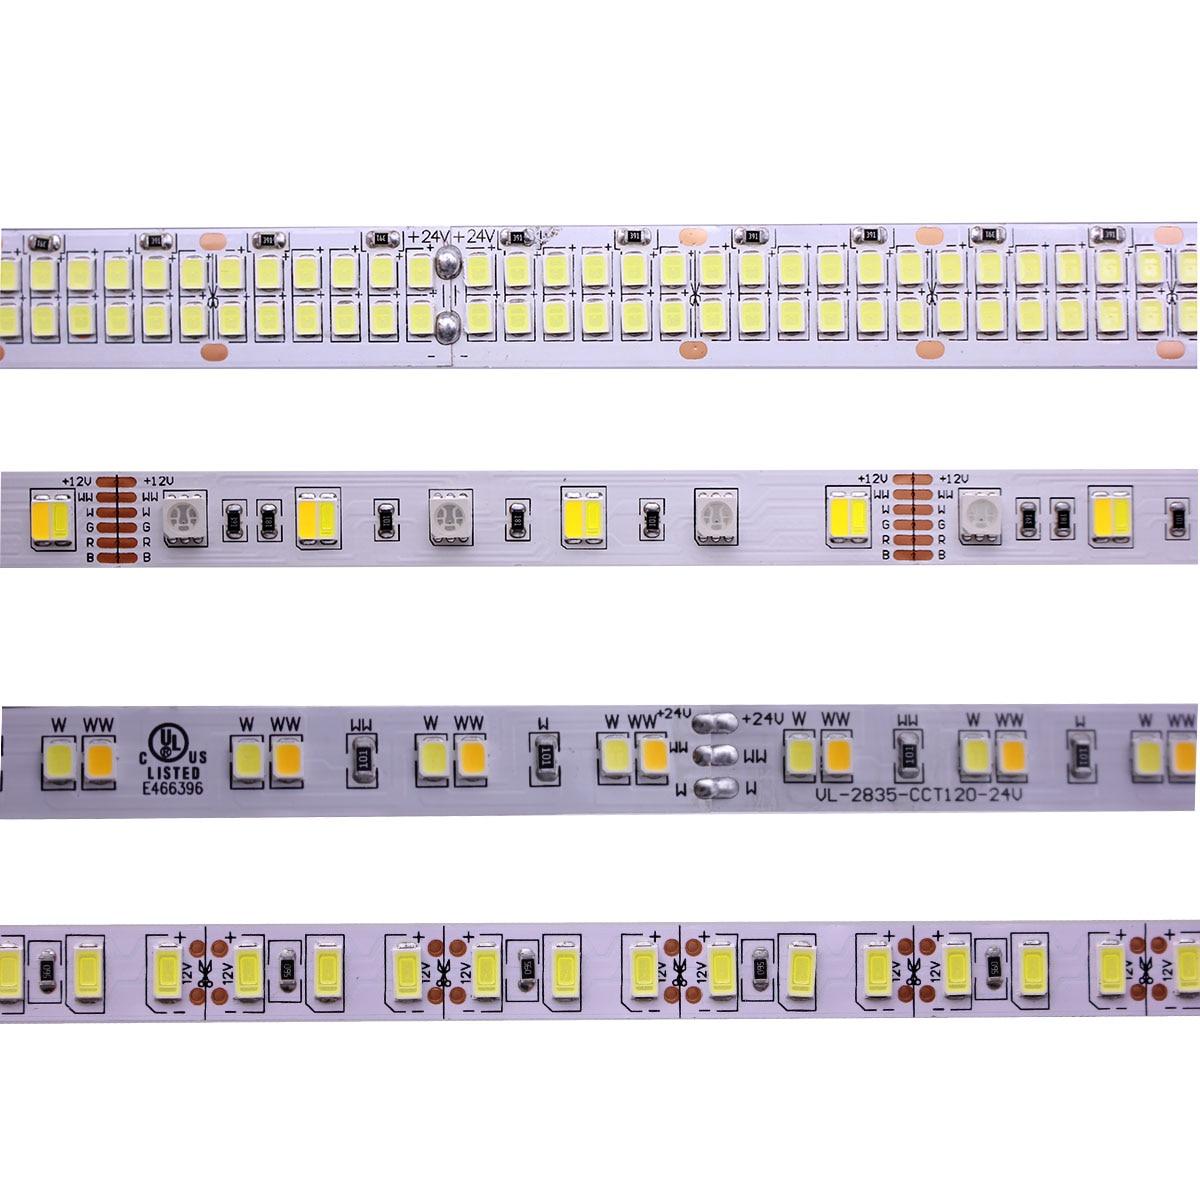 LED Strip 5M 2835 5730 5050 5054 RGB CCT RGBCCT RGBW RGBWW WARM WHITE 60/120/240/480 LED 4in1 12V 24V Tape Light Strips Flexible